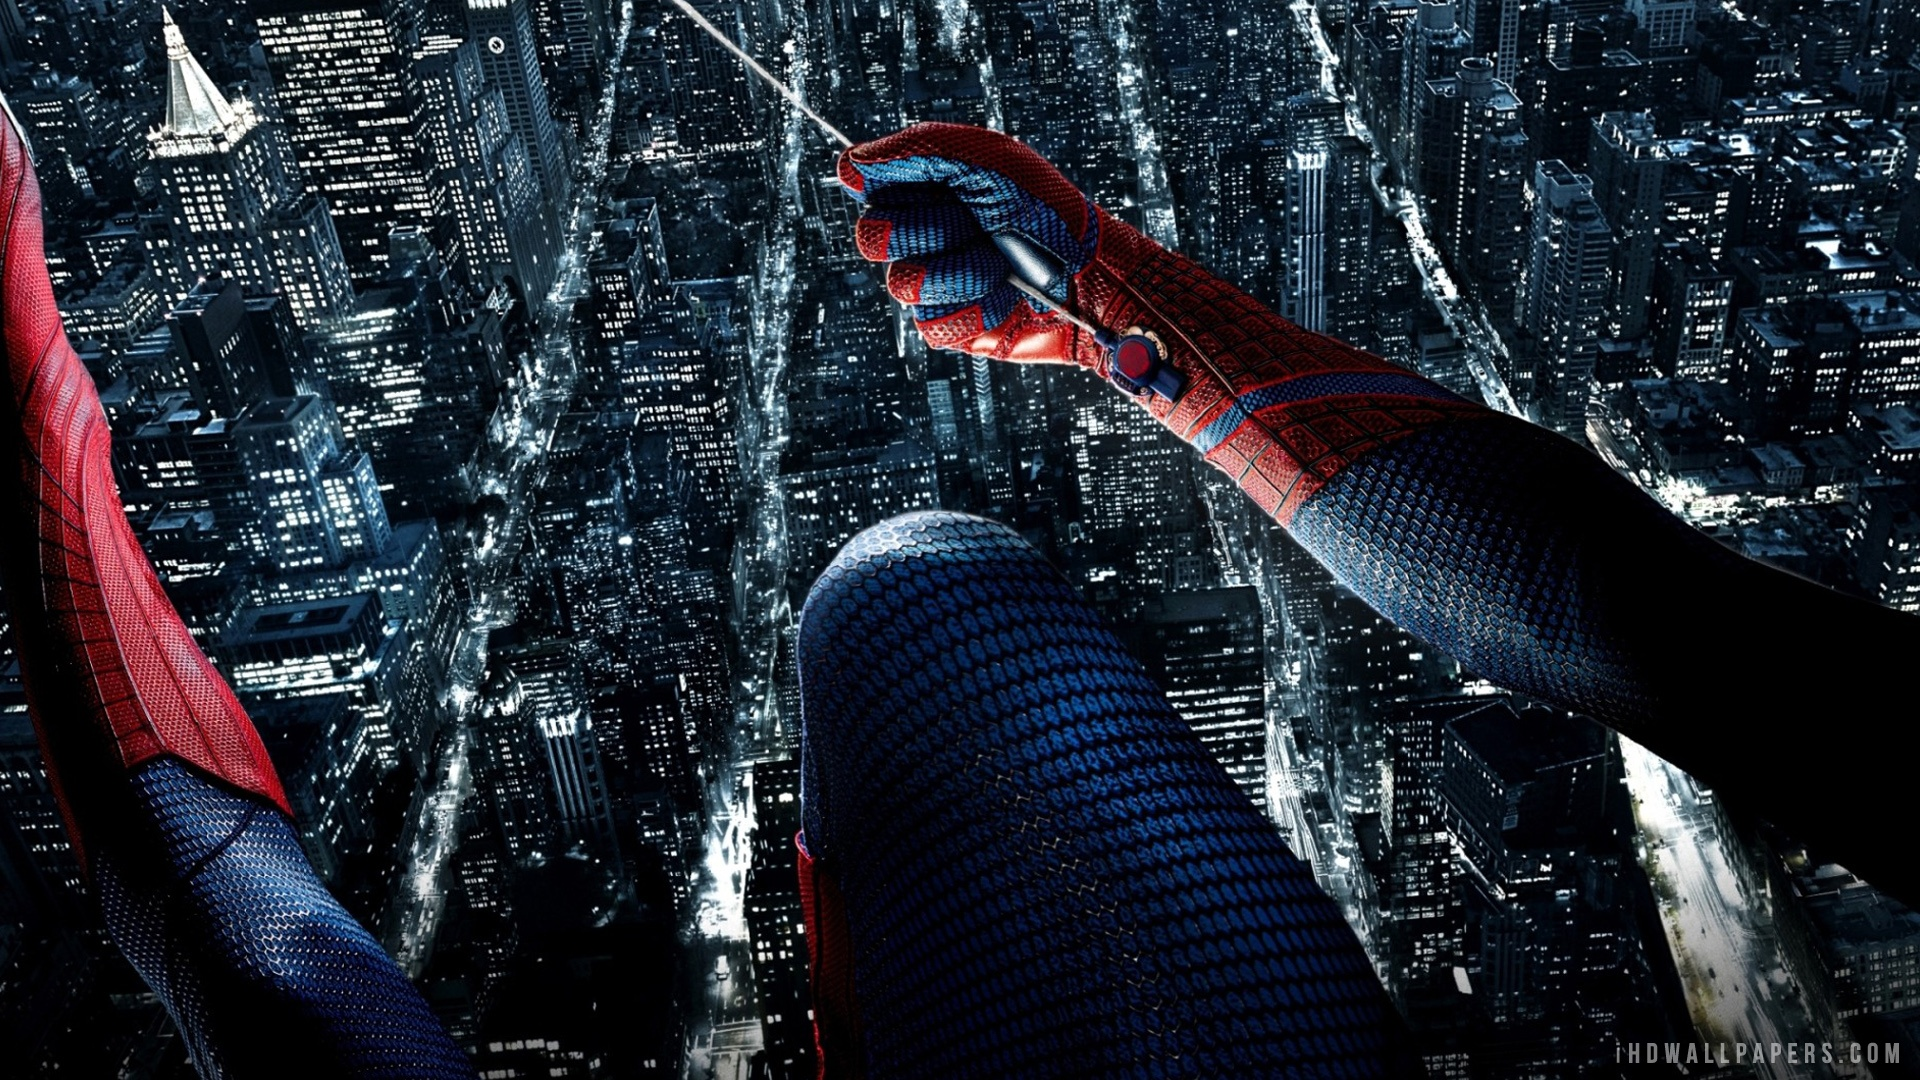 Amazing Spider Man New York City WallpaperBackground in 1920x1080 HD 1920x1080